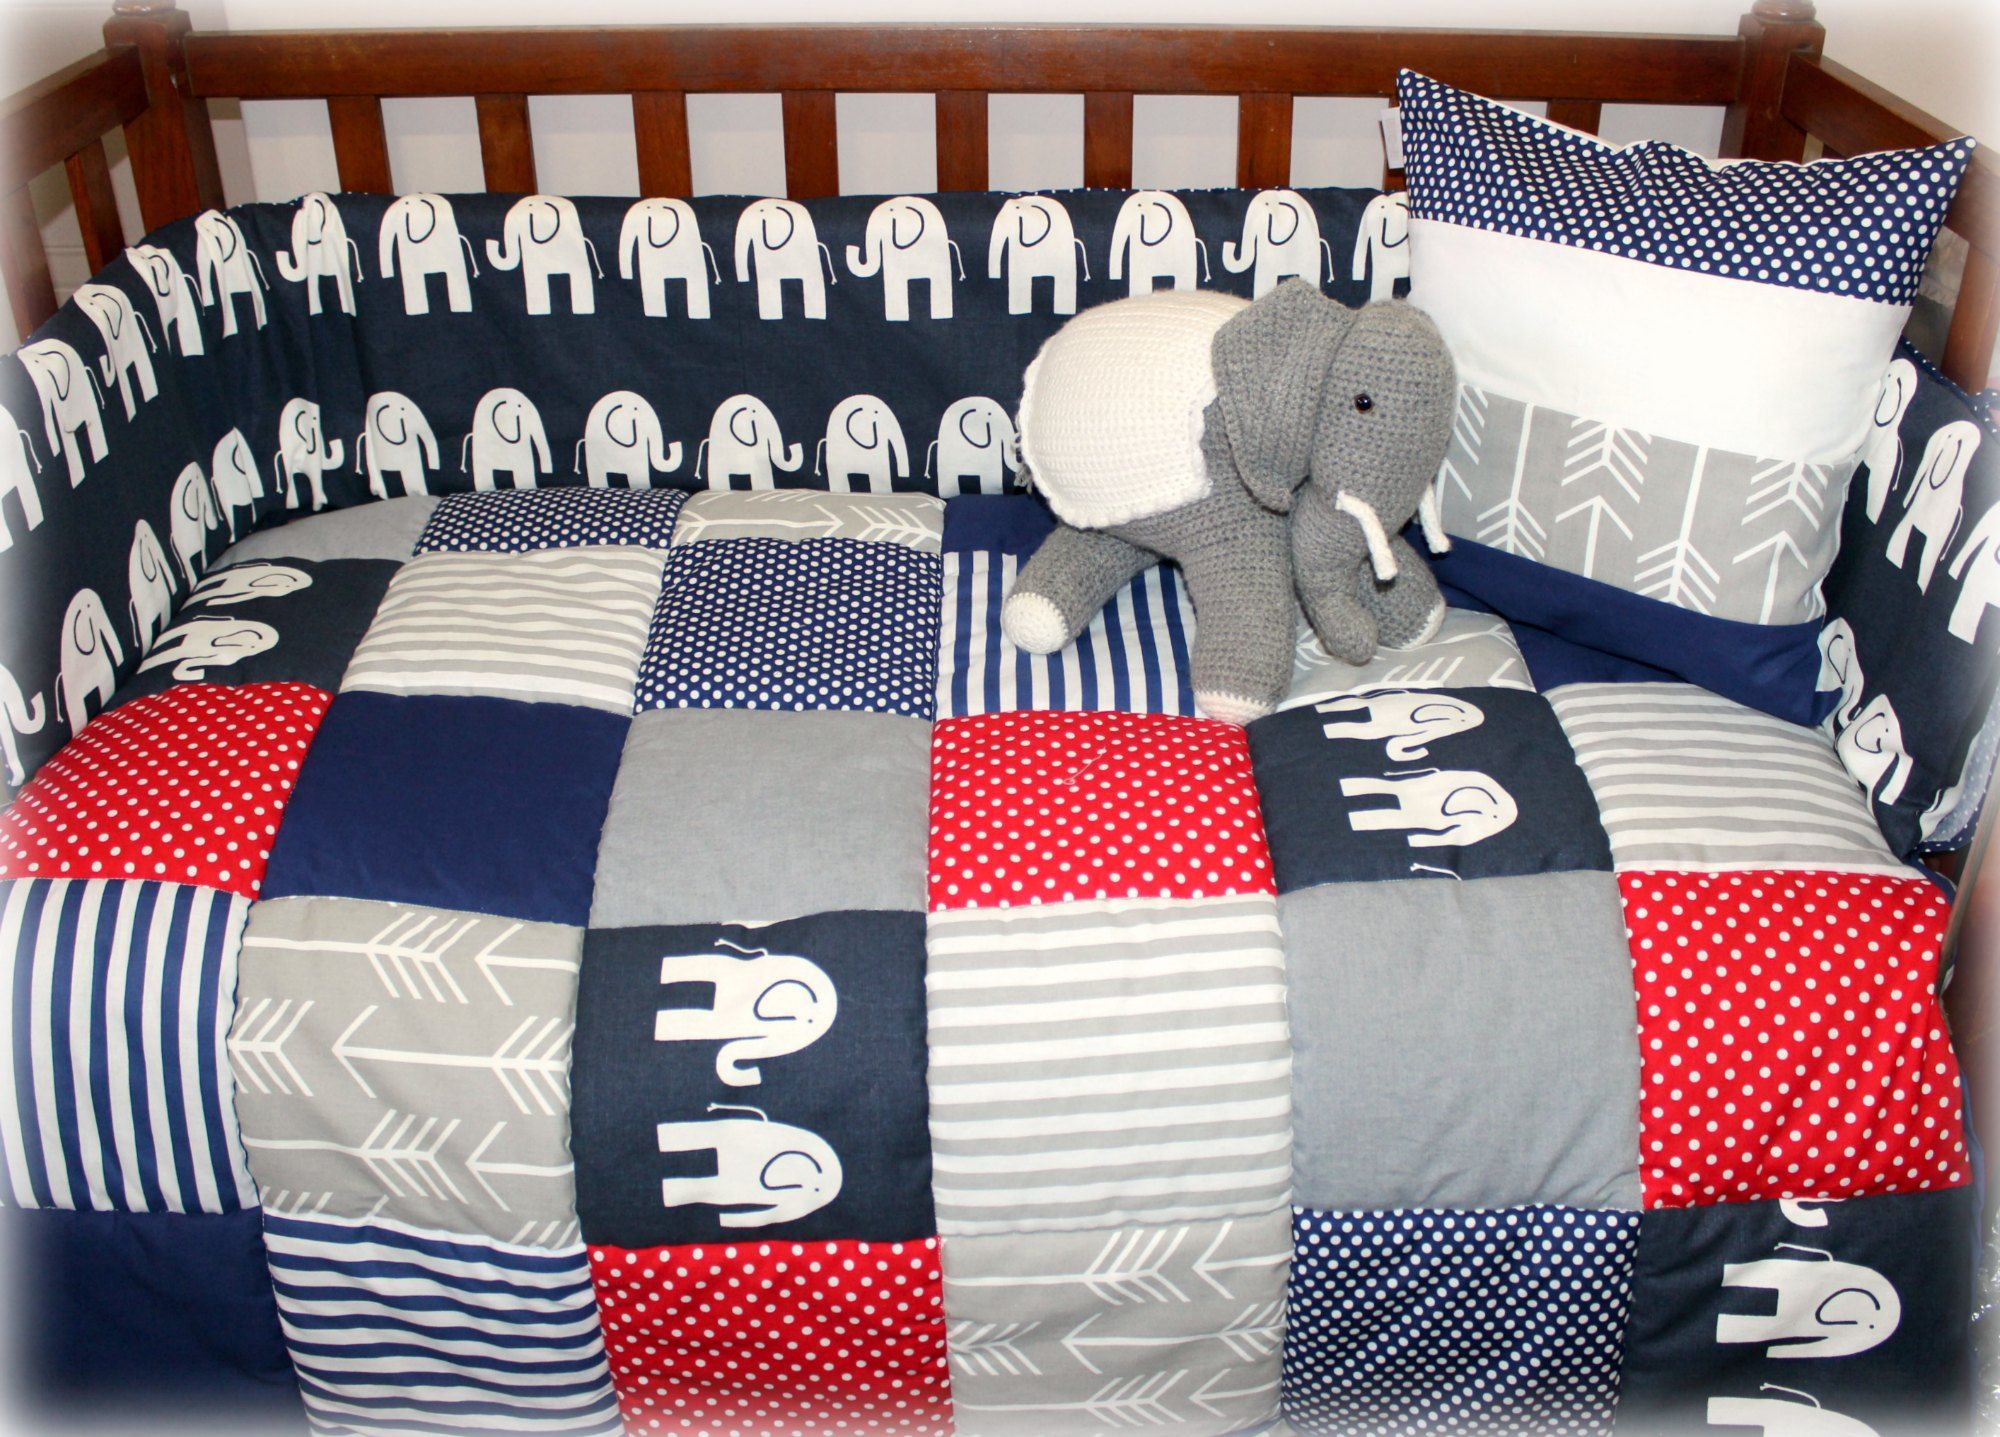 Baby cribs co za - Elephant Theme Baby Linen Cot Linen Nursery Linen Crib Linen In Navy